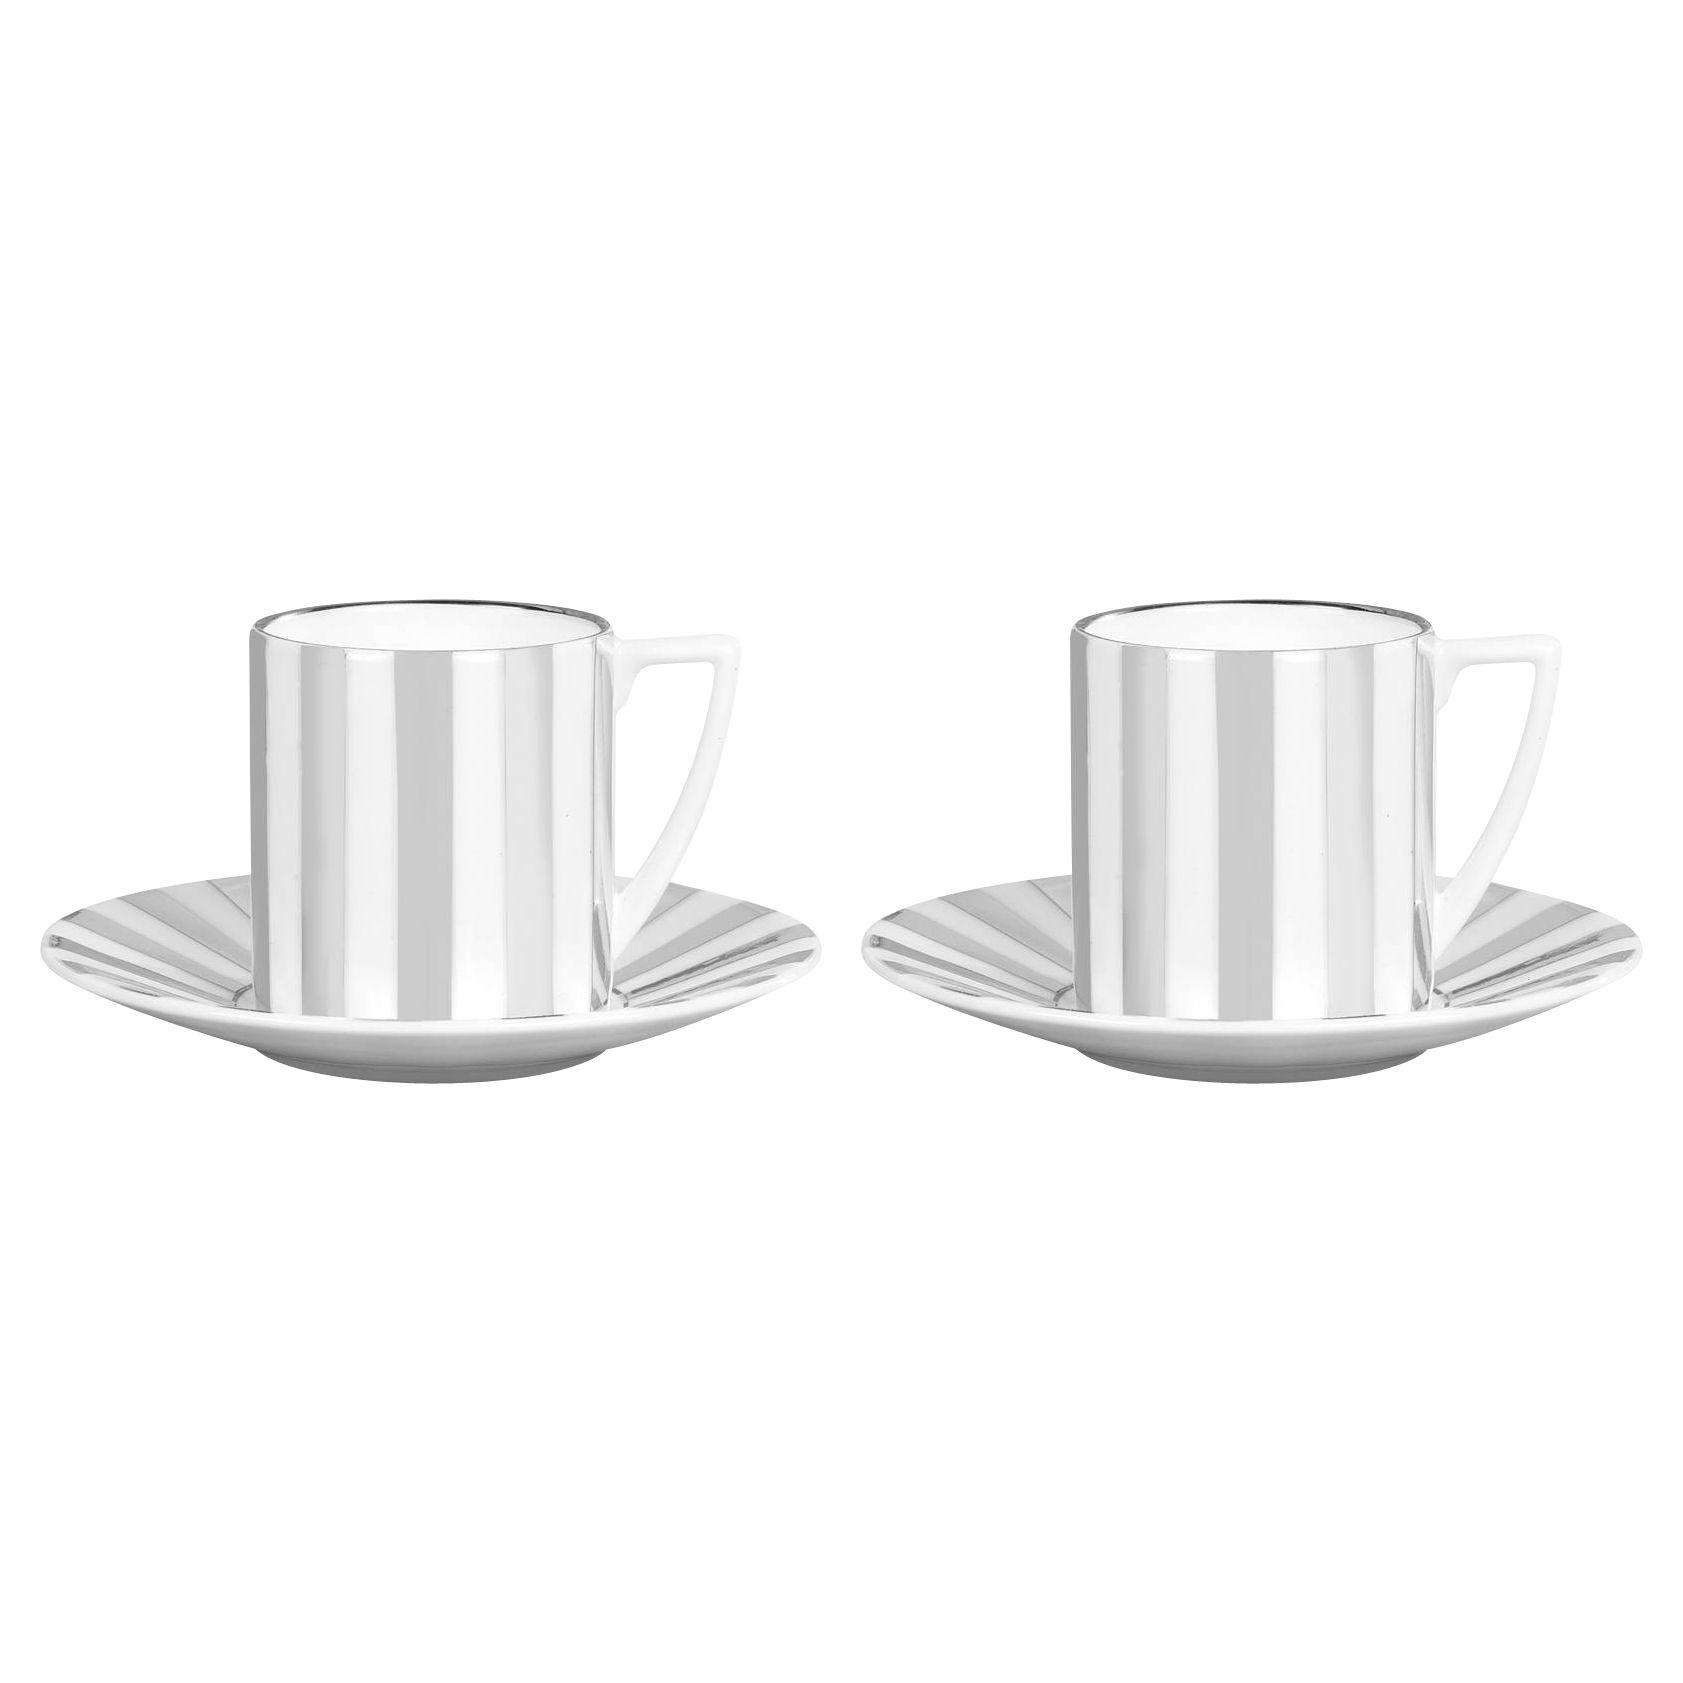 Jasper Conran Jasper Conran for Wedgwood Platinum Espresso Cups and Saucers, Set of 2